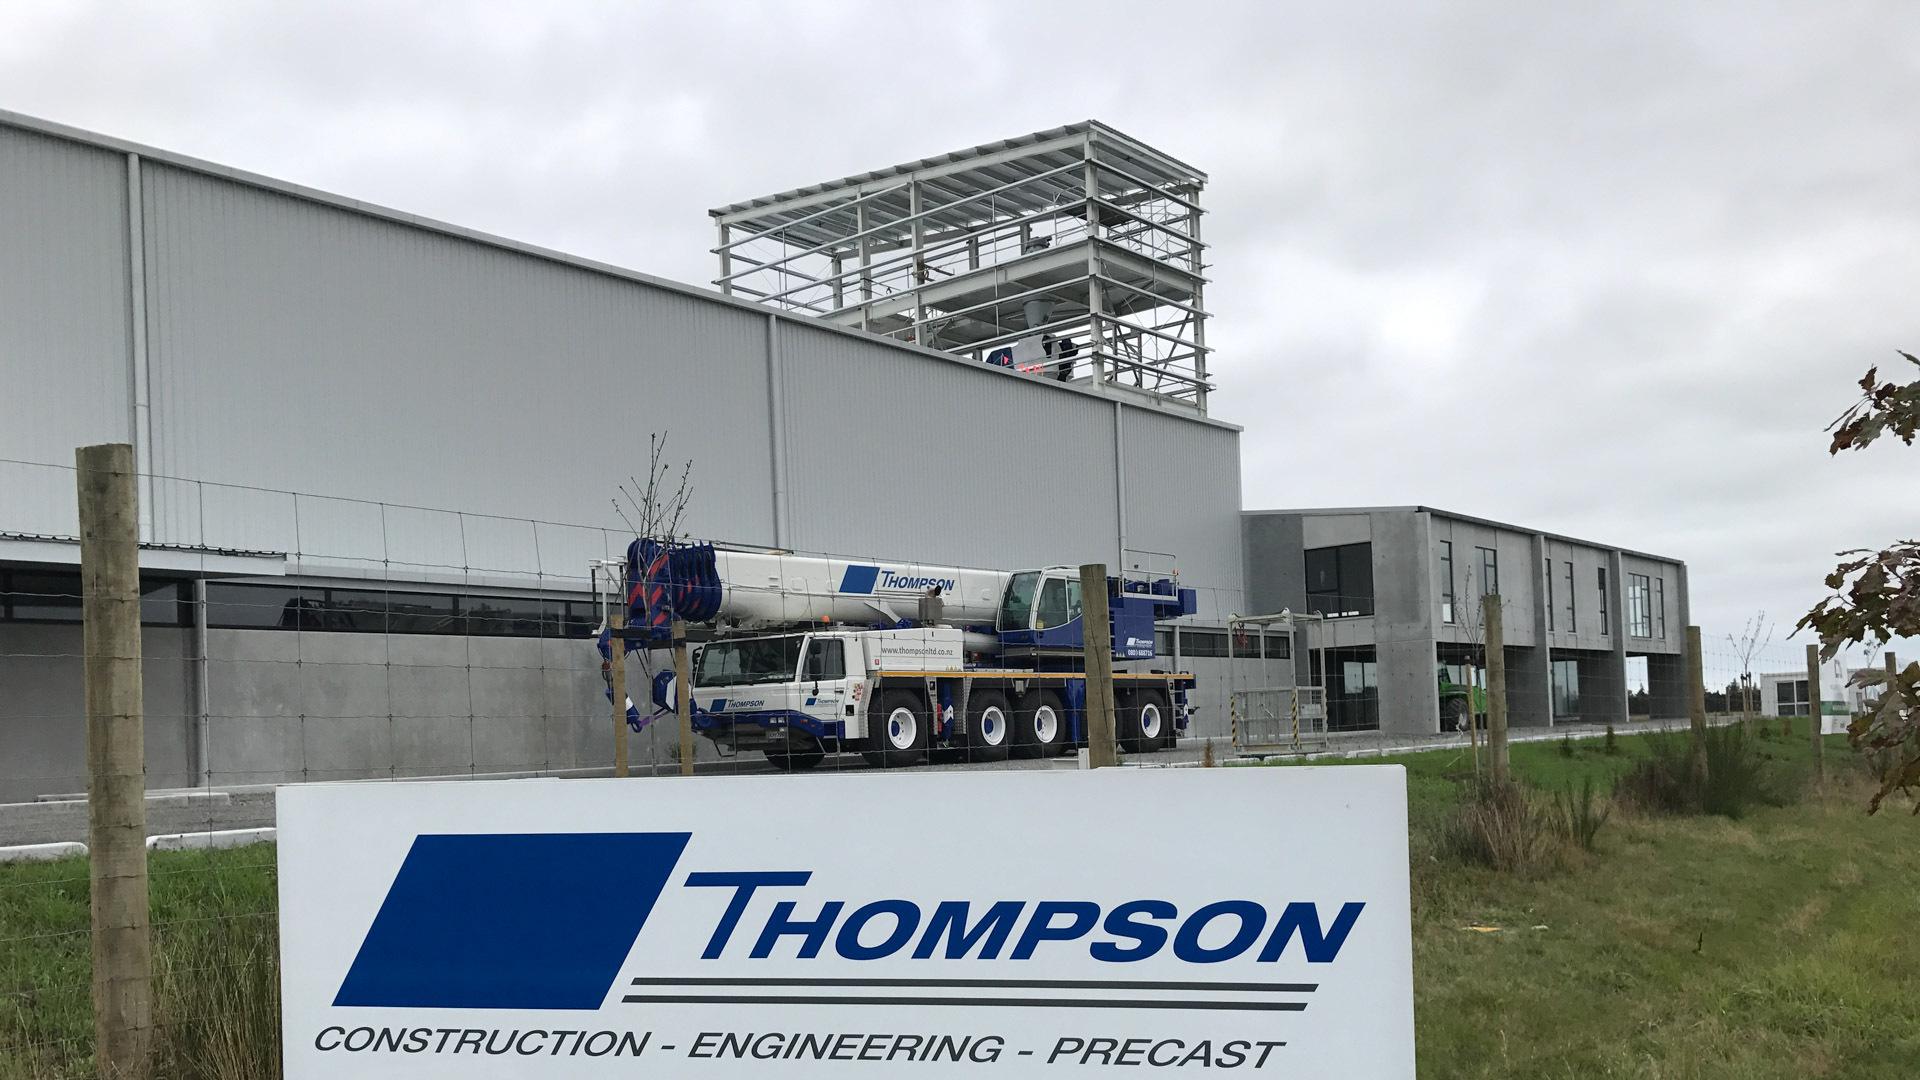 ThompsonLtd-NZ_Dairy_1.jpg